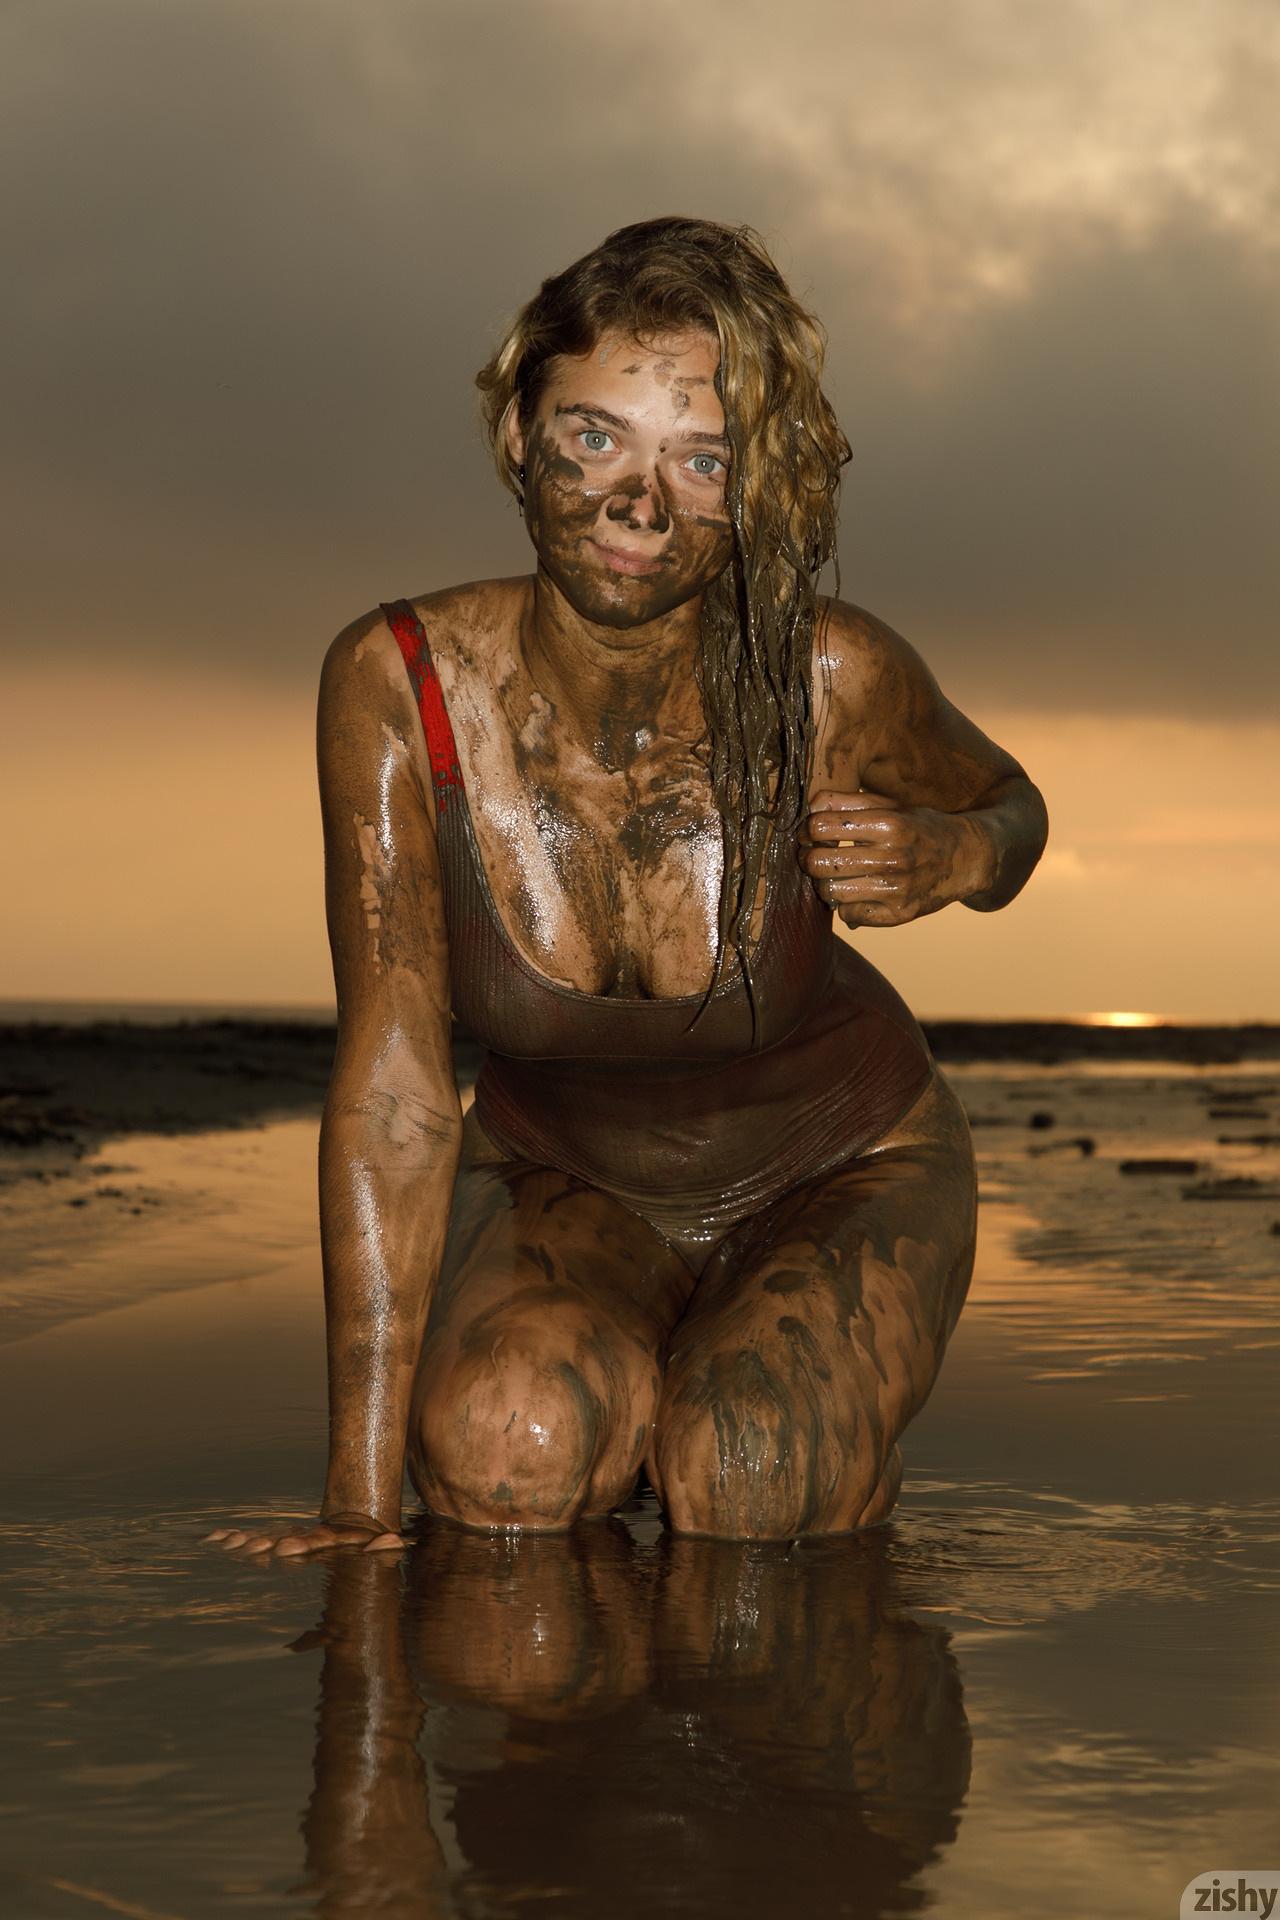 Sofia Orlova On Gryaznyy Beach Zishy (49)